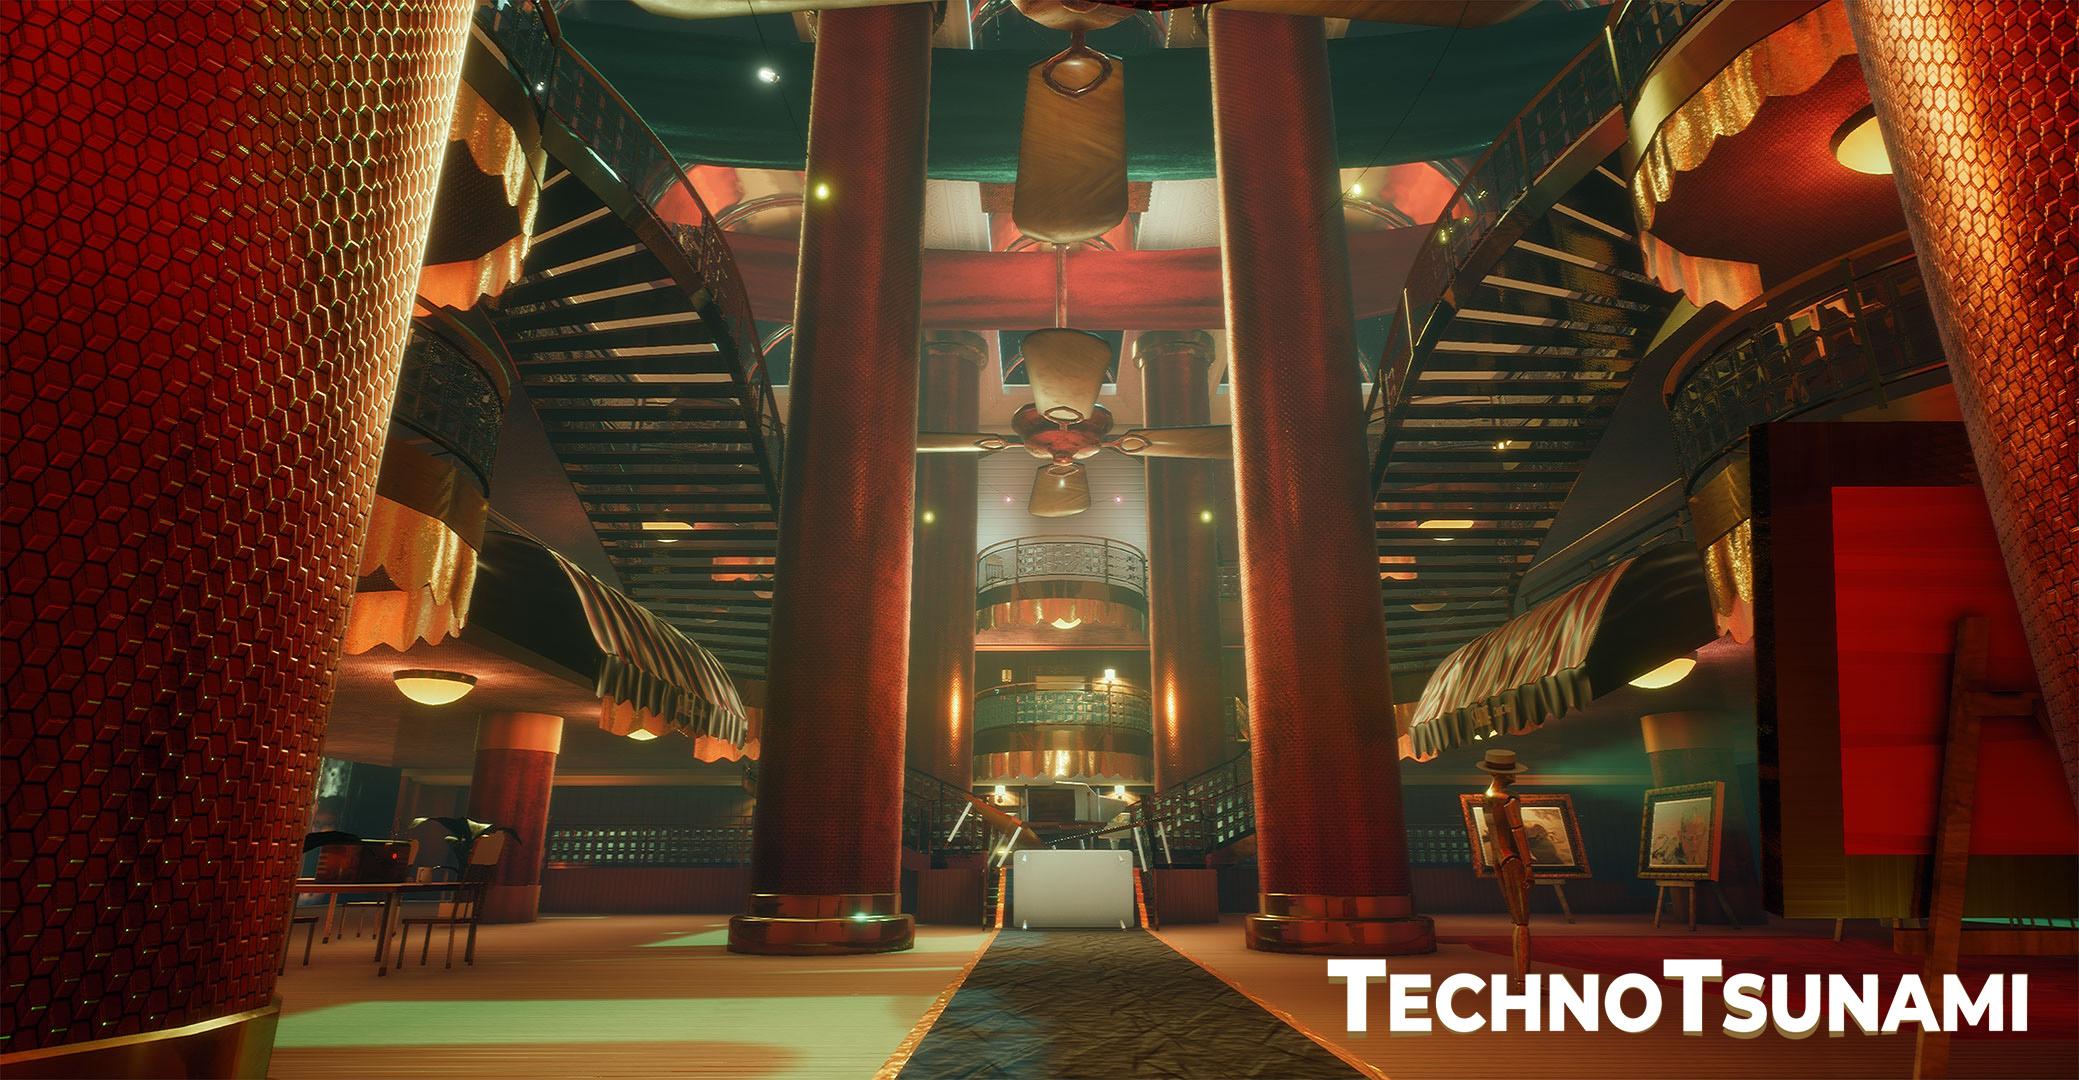 TechnoTsunami Atrium